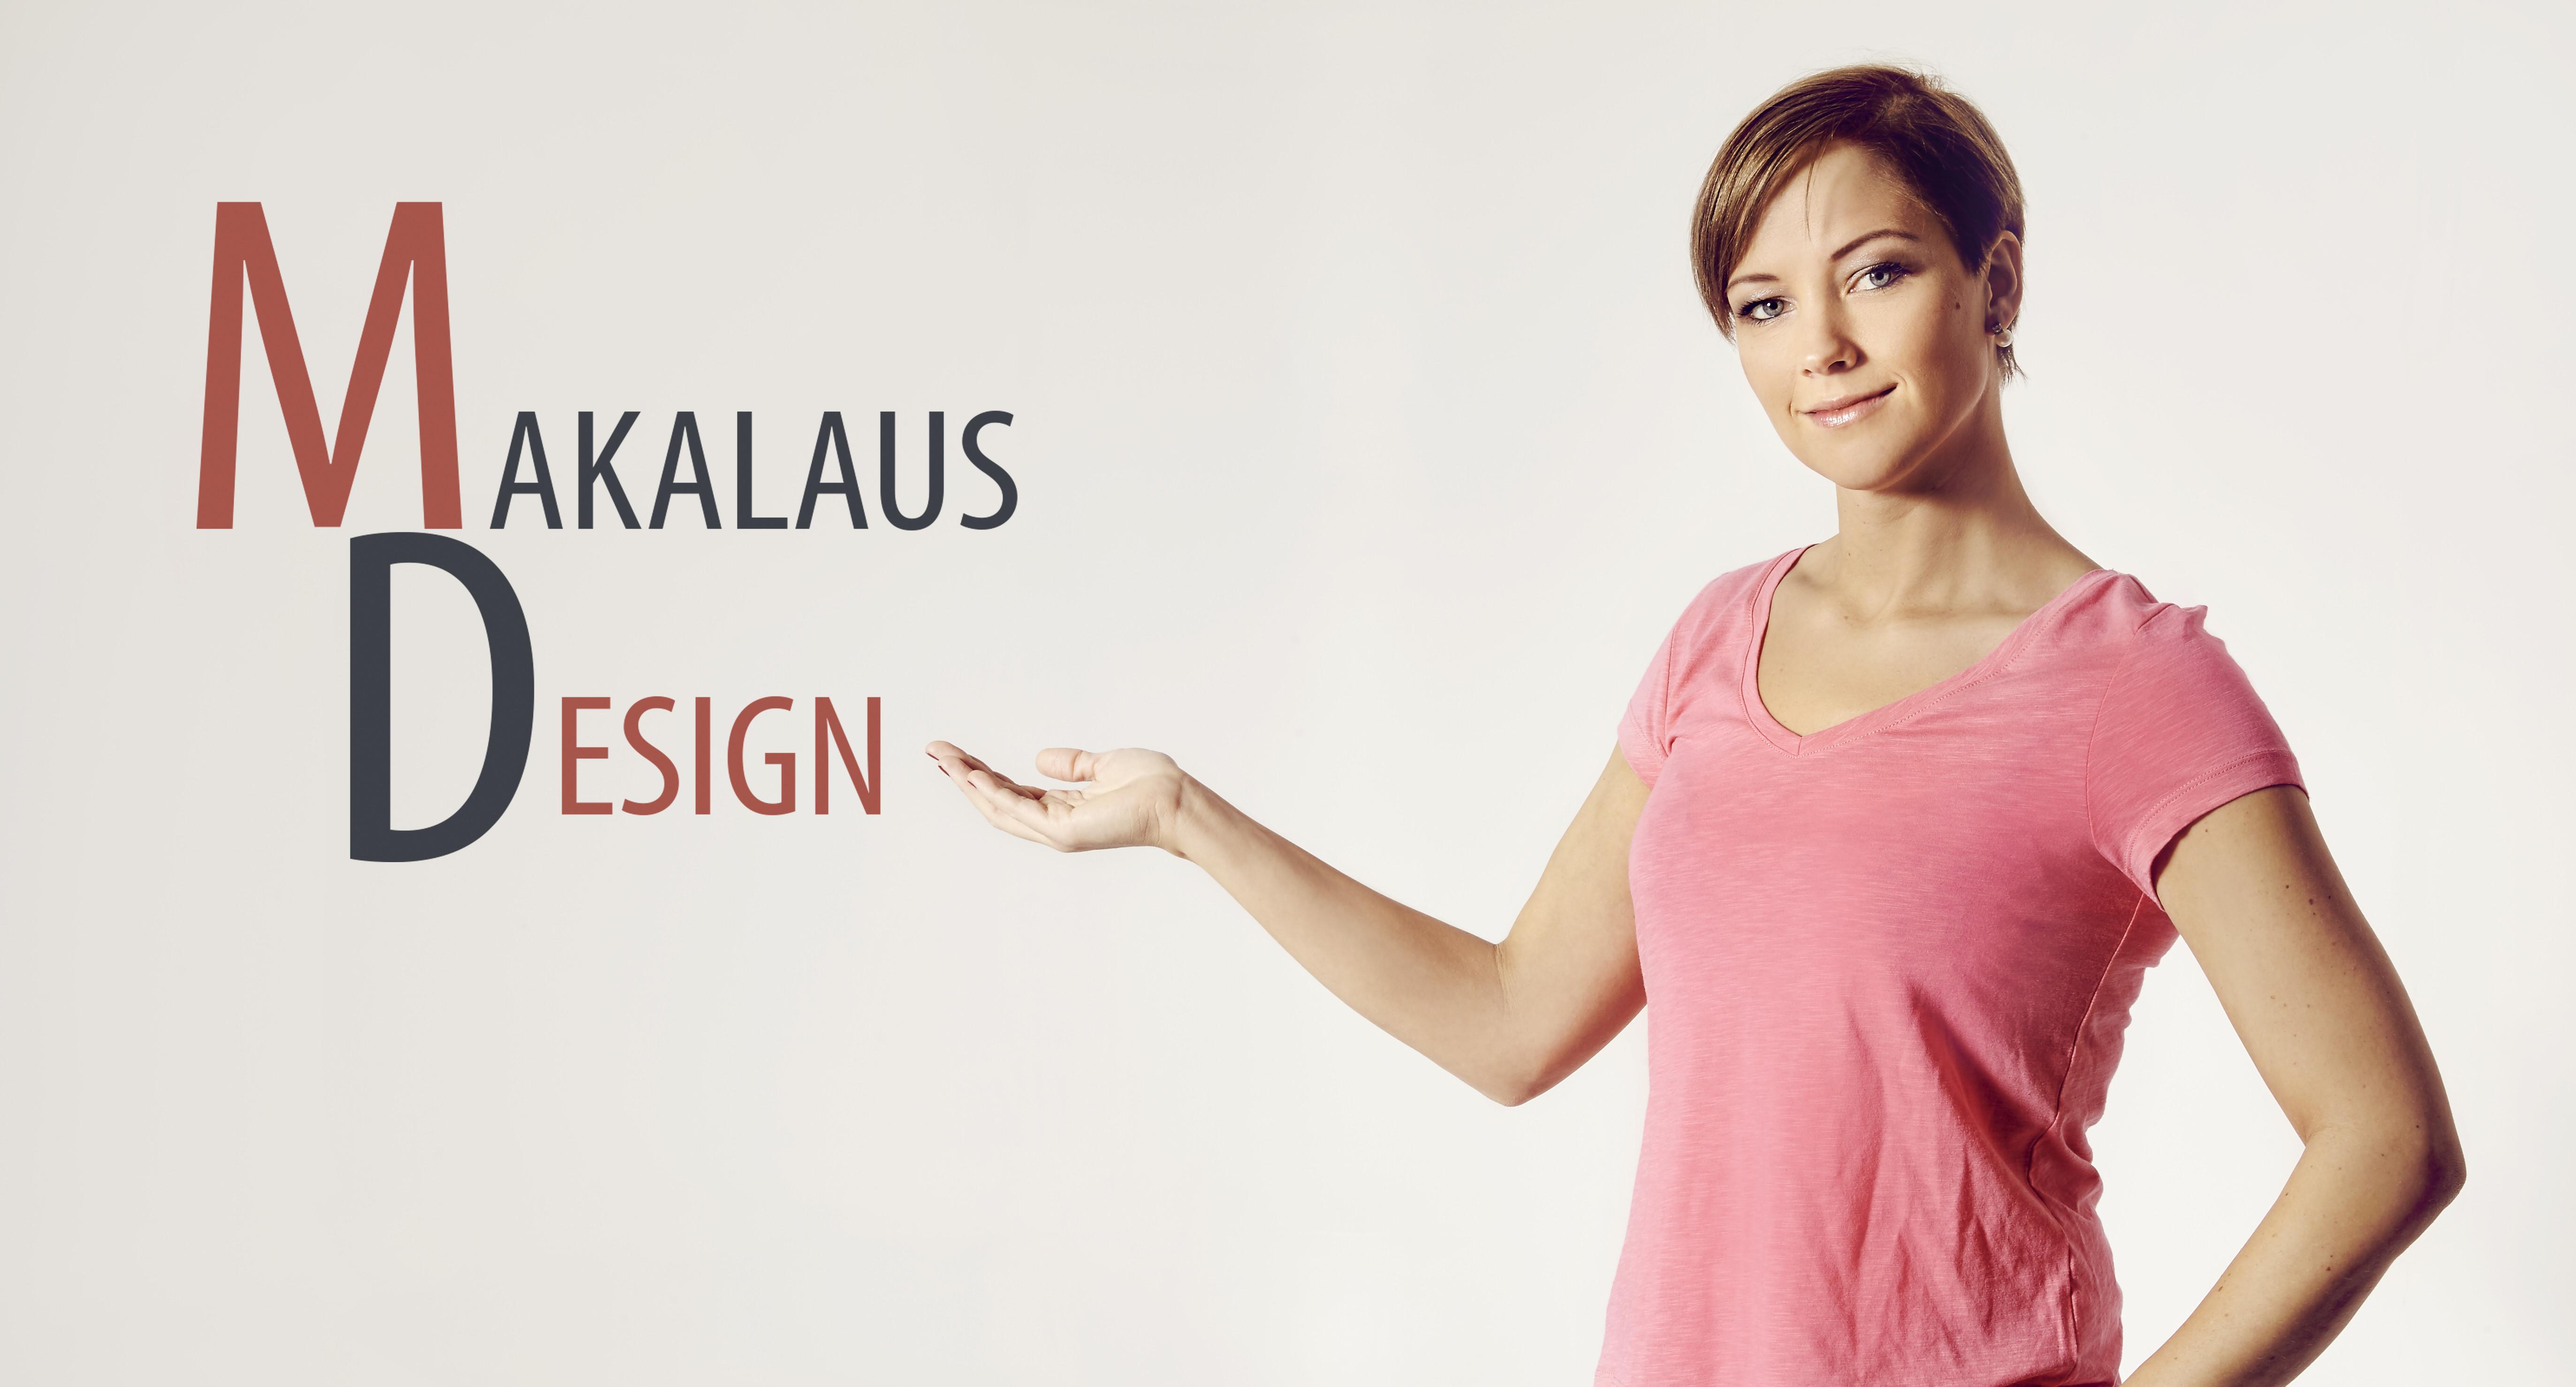 Makalaus Design